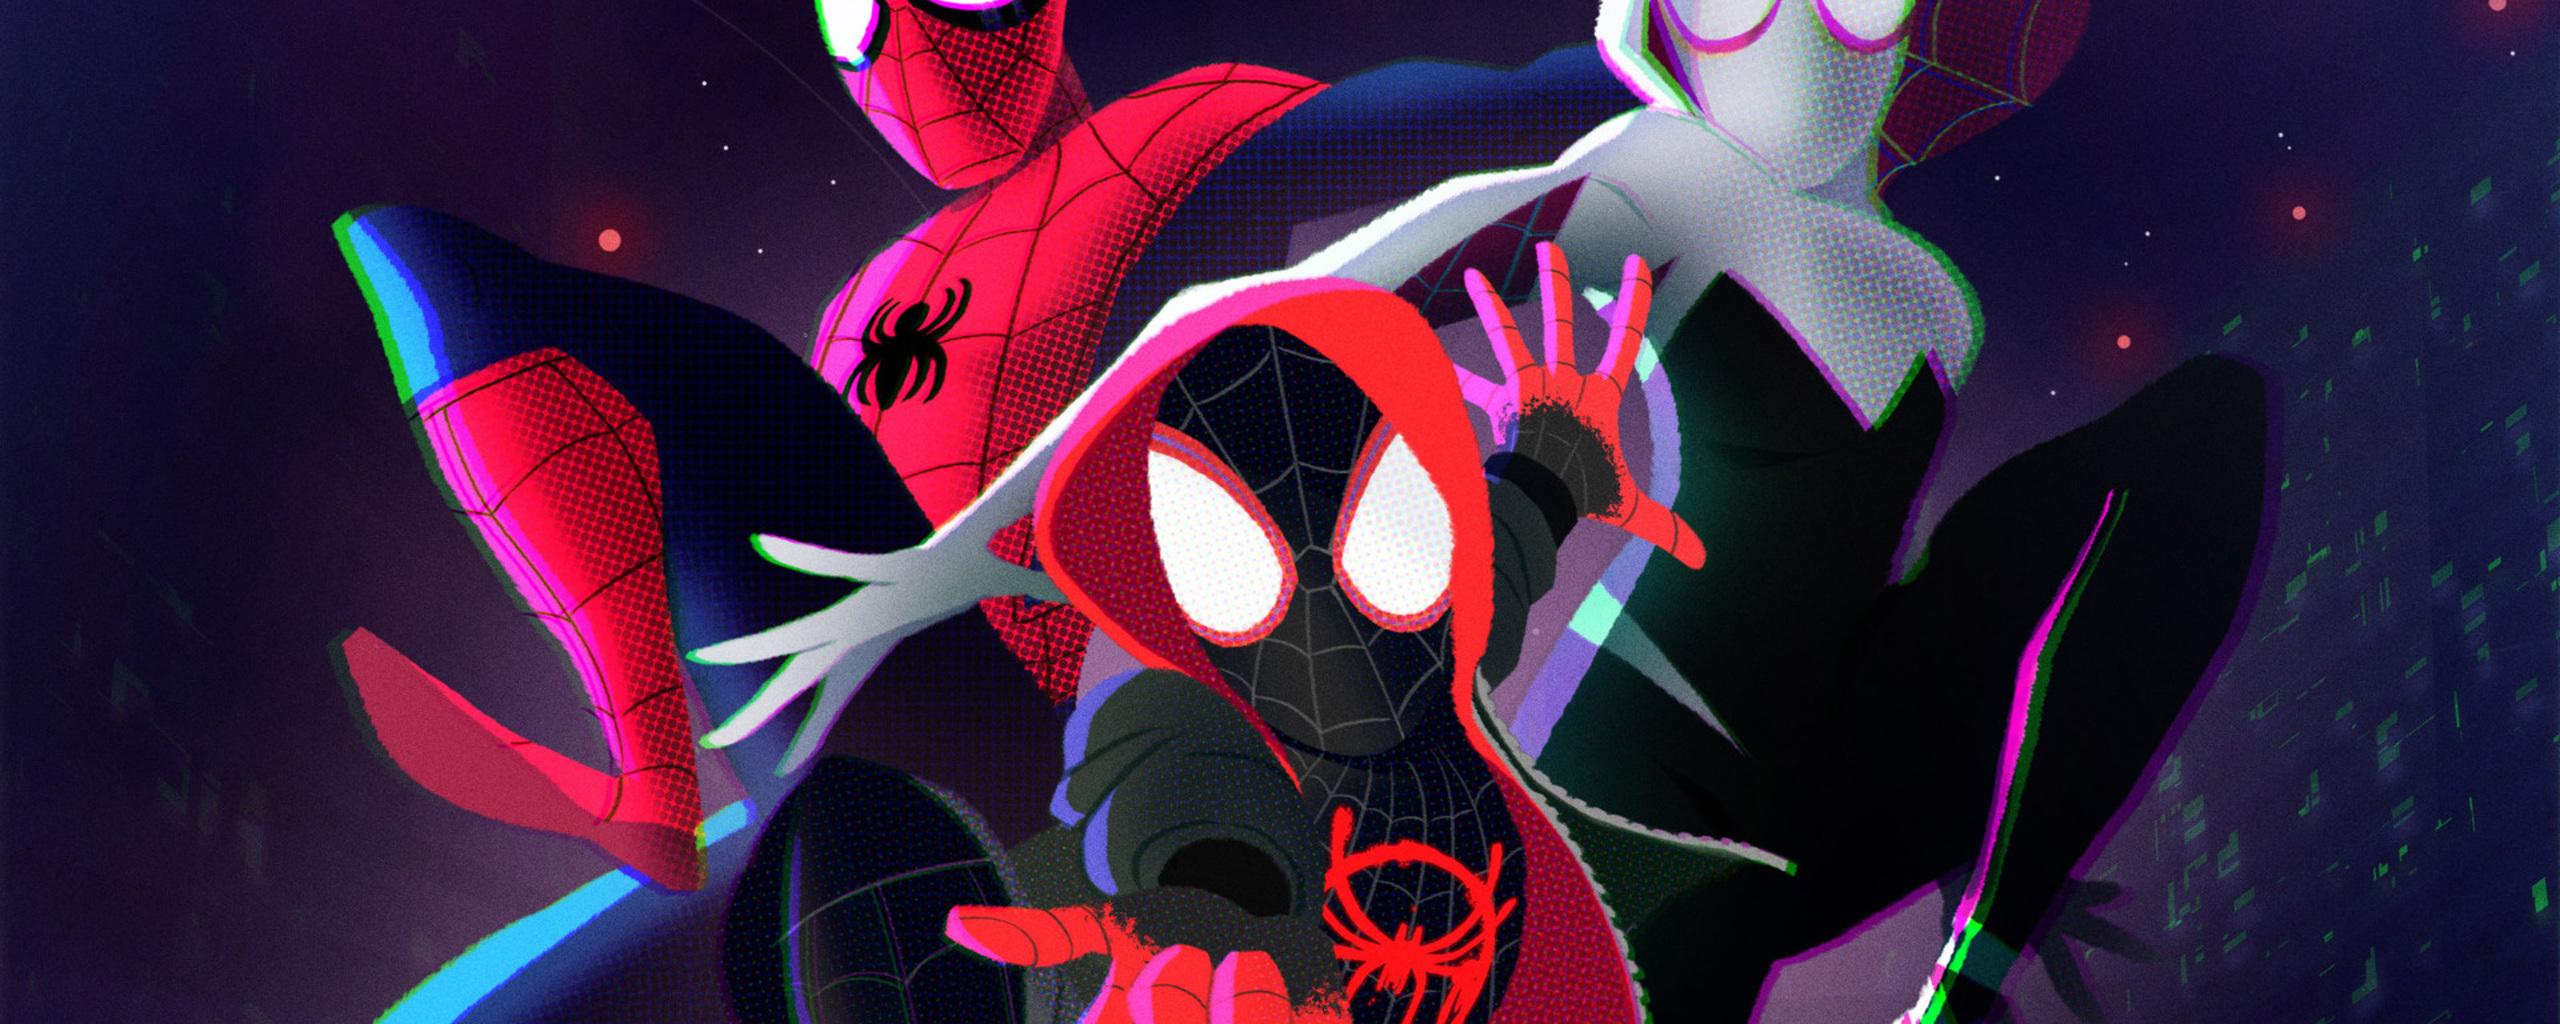 2560x1024 SpiderMan Into The Spider Verse 2018 Art